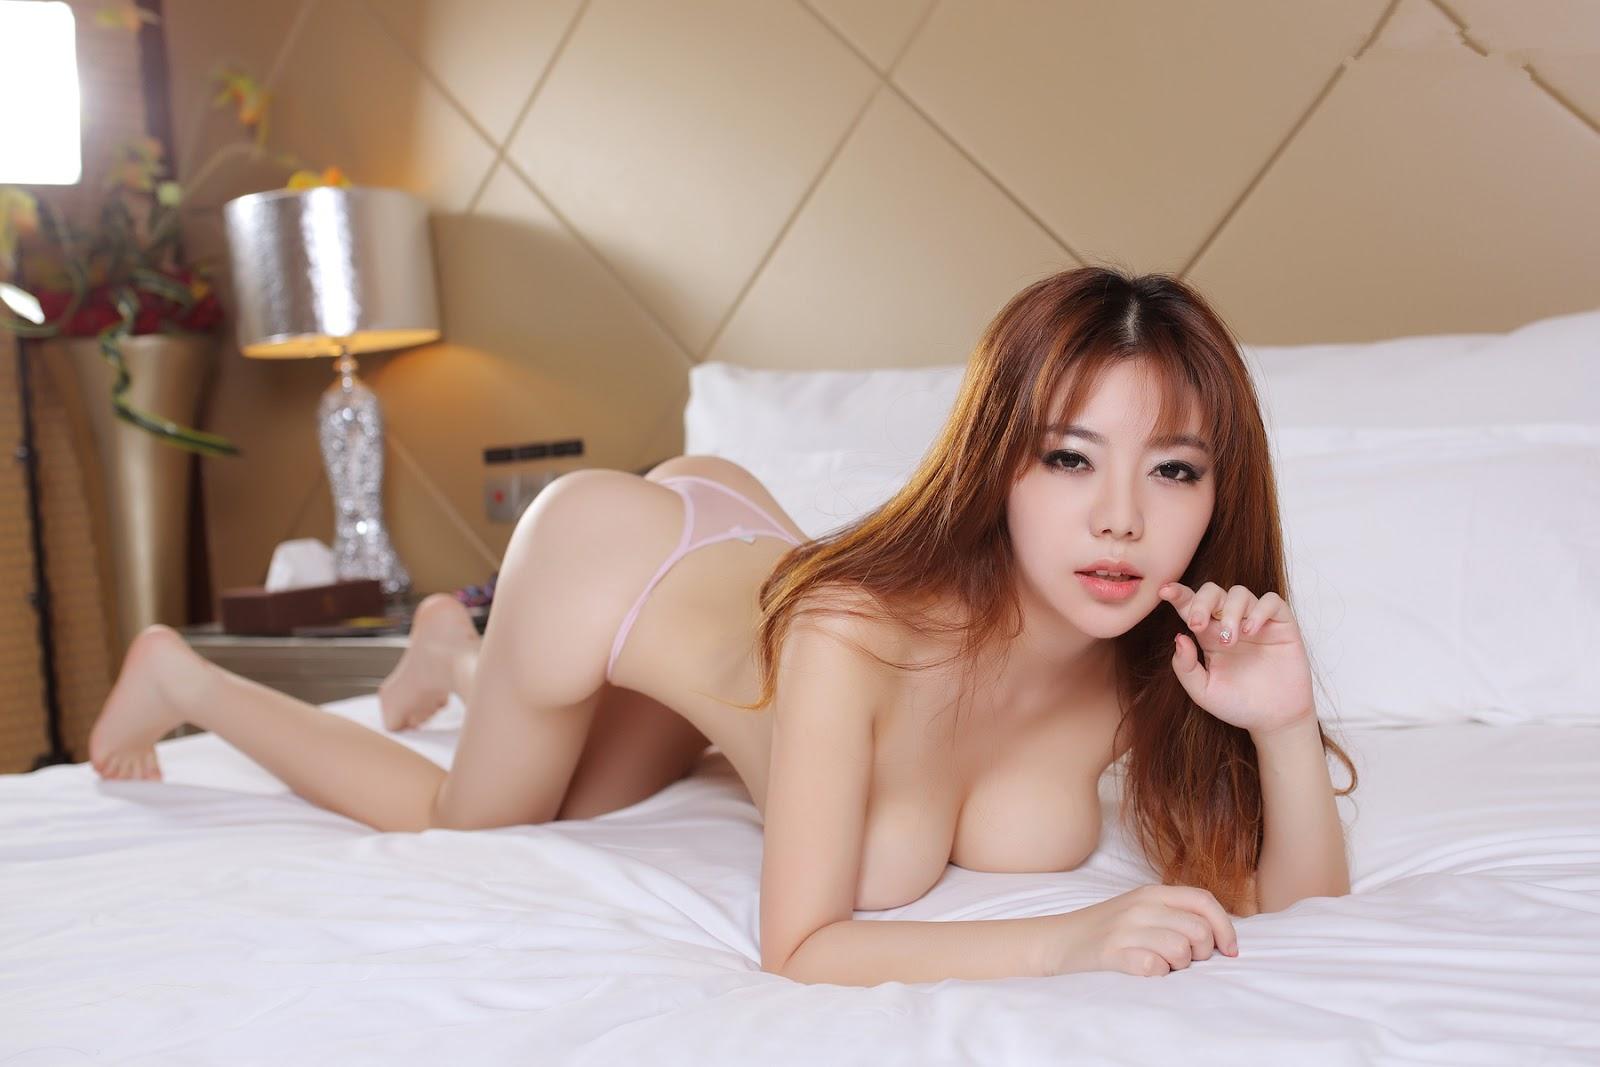 %2529%252B%252B%25C2%25A6%25C2%25B7 60 - TGOD Sexy Nude FAYE